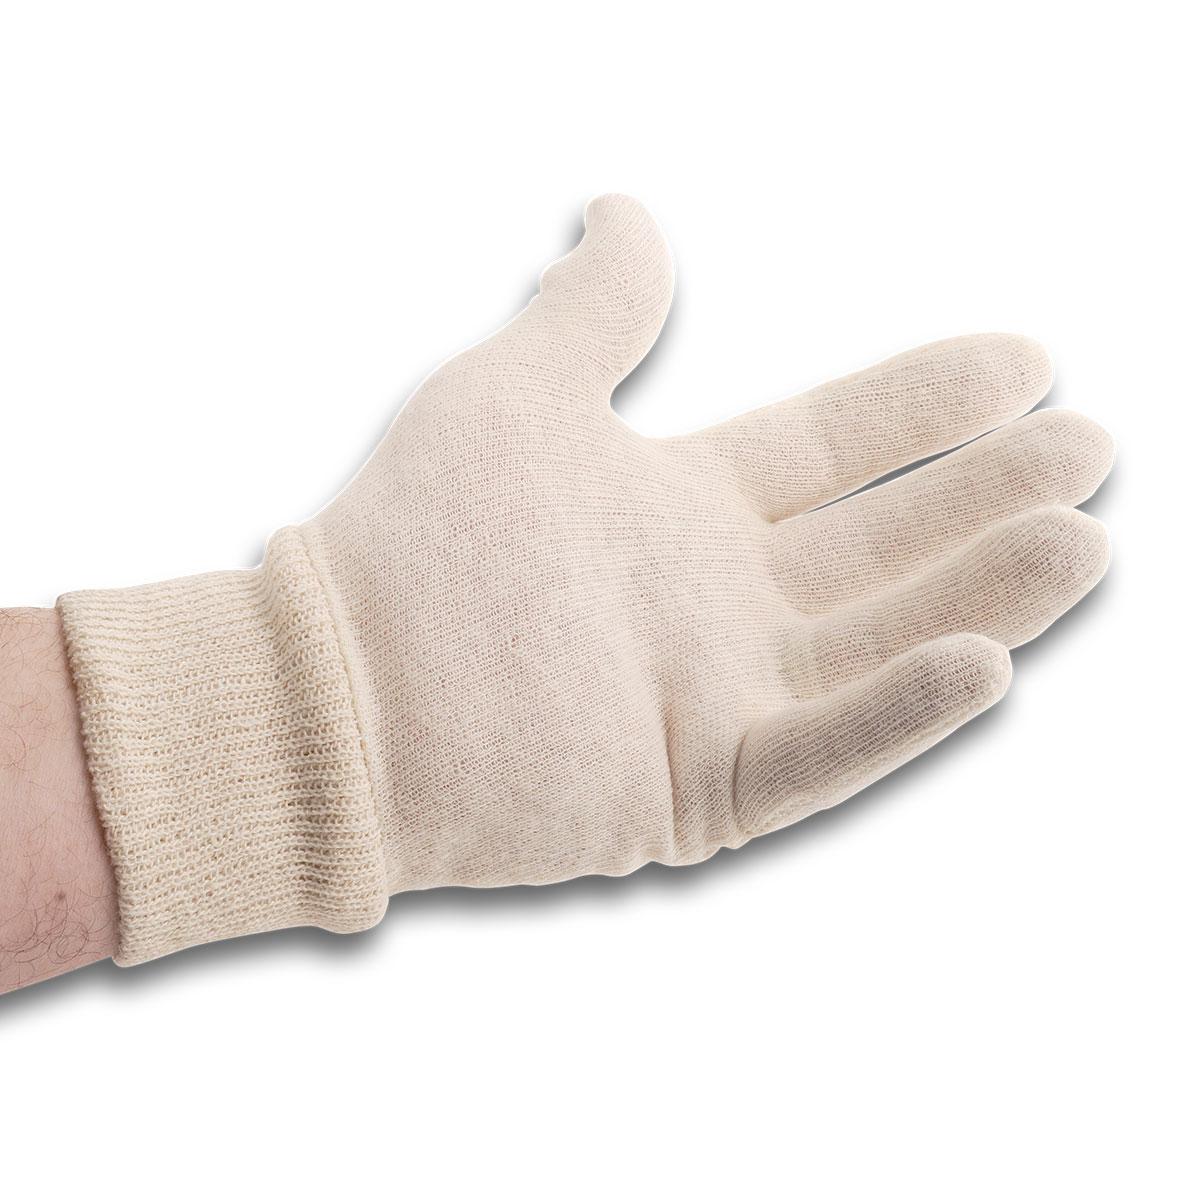 weie tricot handschuhe fr reinraum